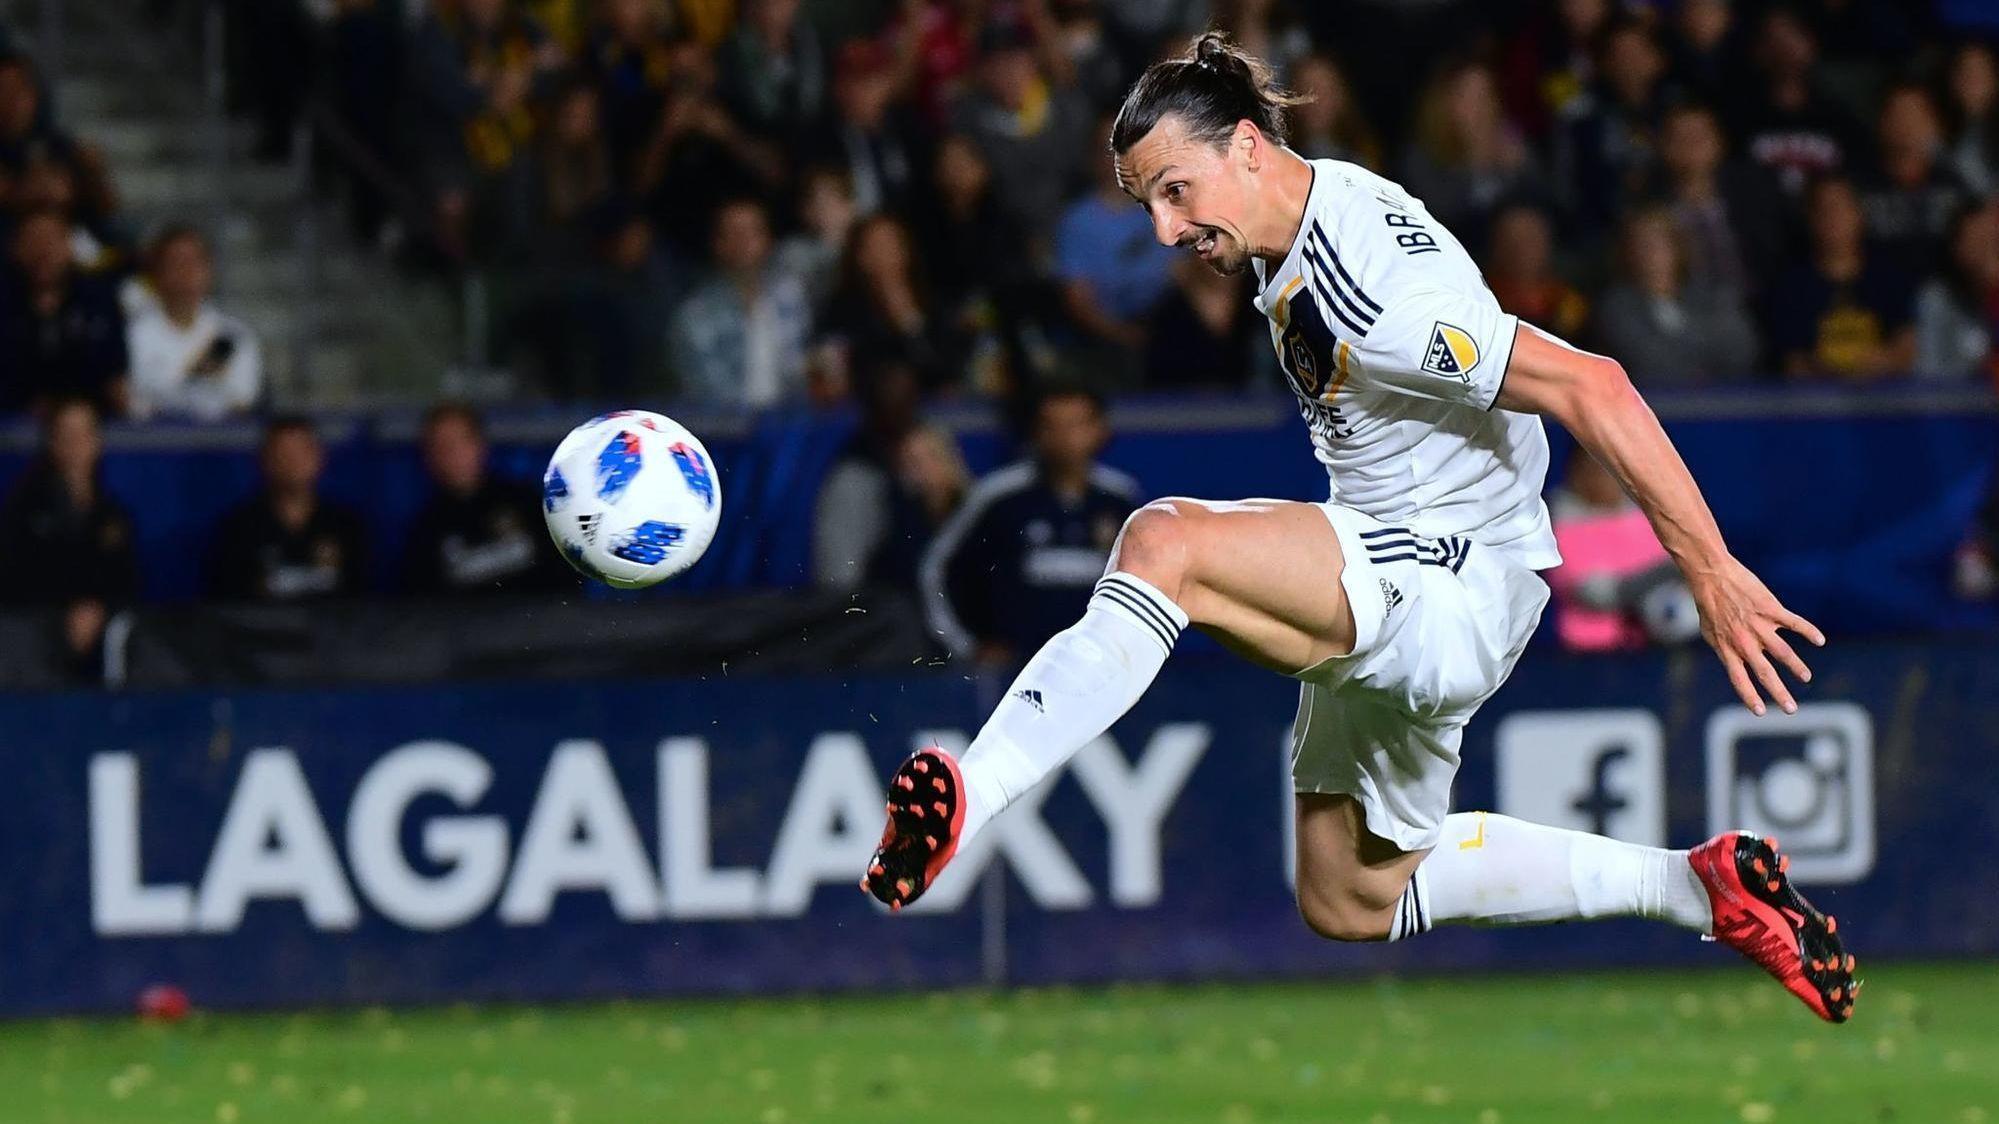 Zlatan Ibrahimovic agrees to return to the Galaxy for 2019 season